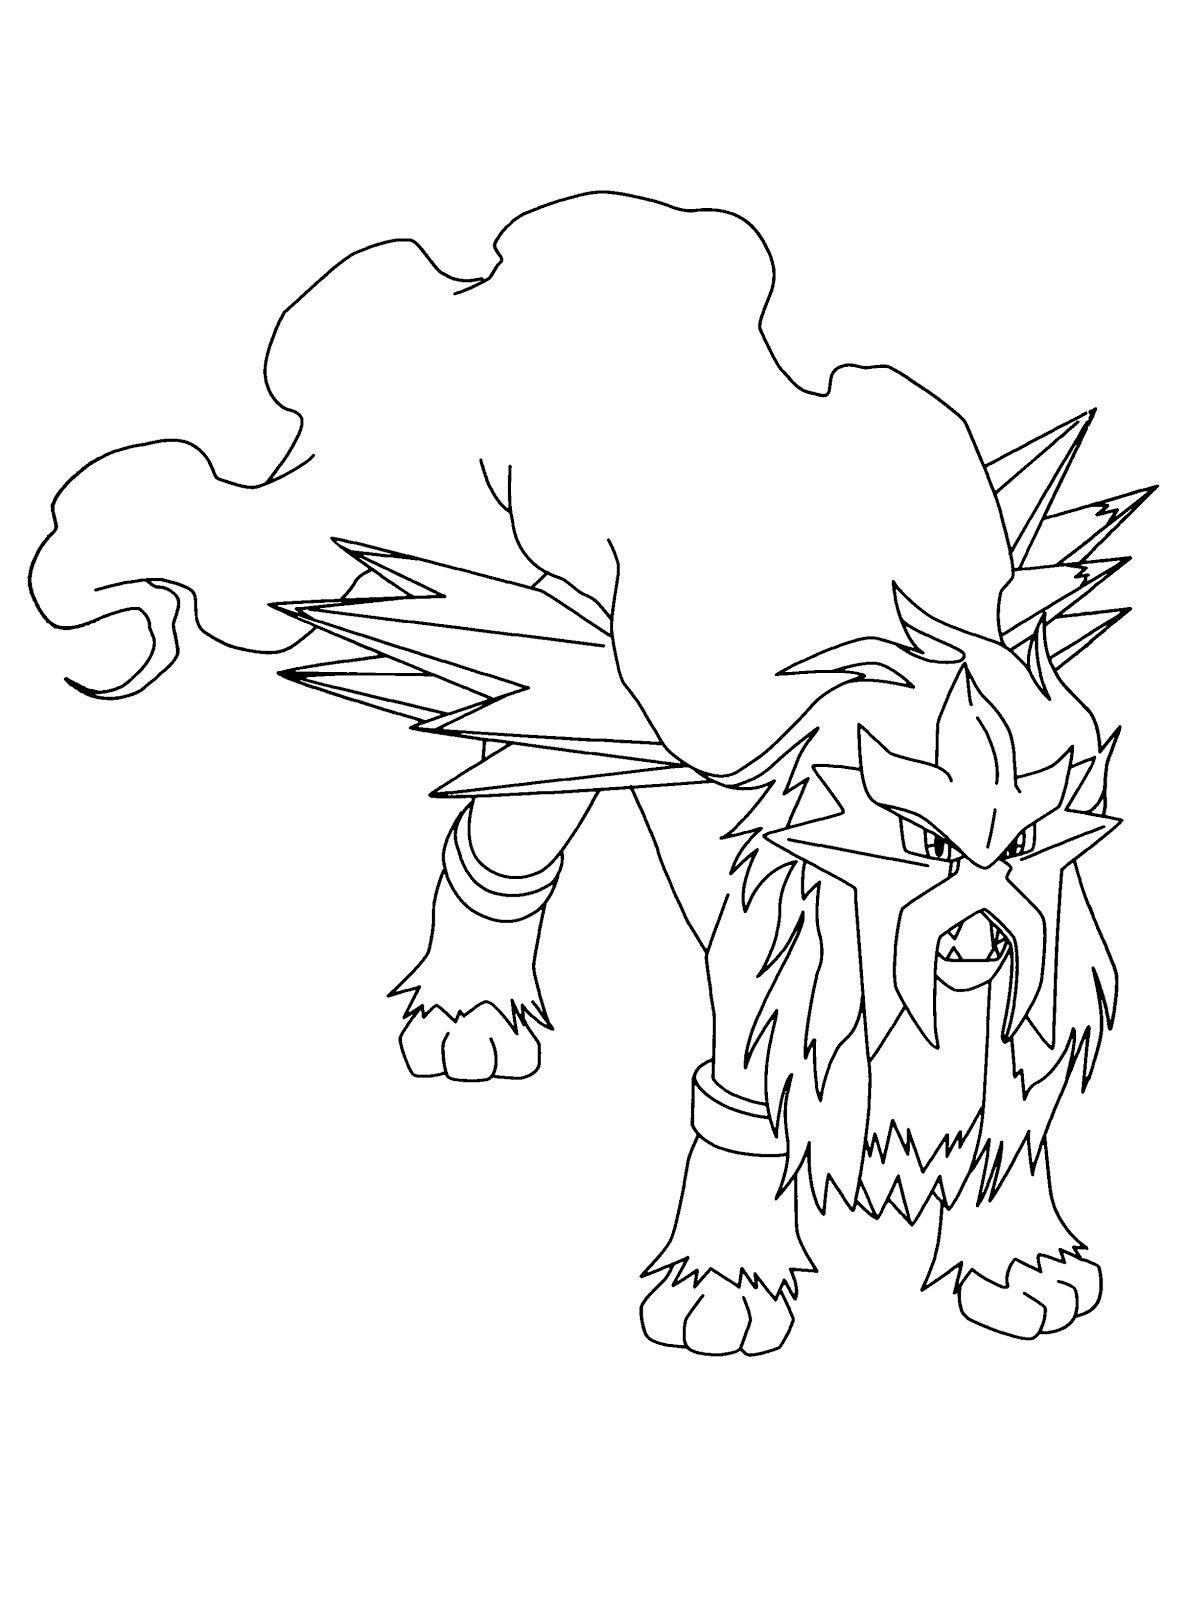 Entei Pokemon Drawing Pokemon Coloring Pages Pokemon Coloring Pokemon Tattoo